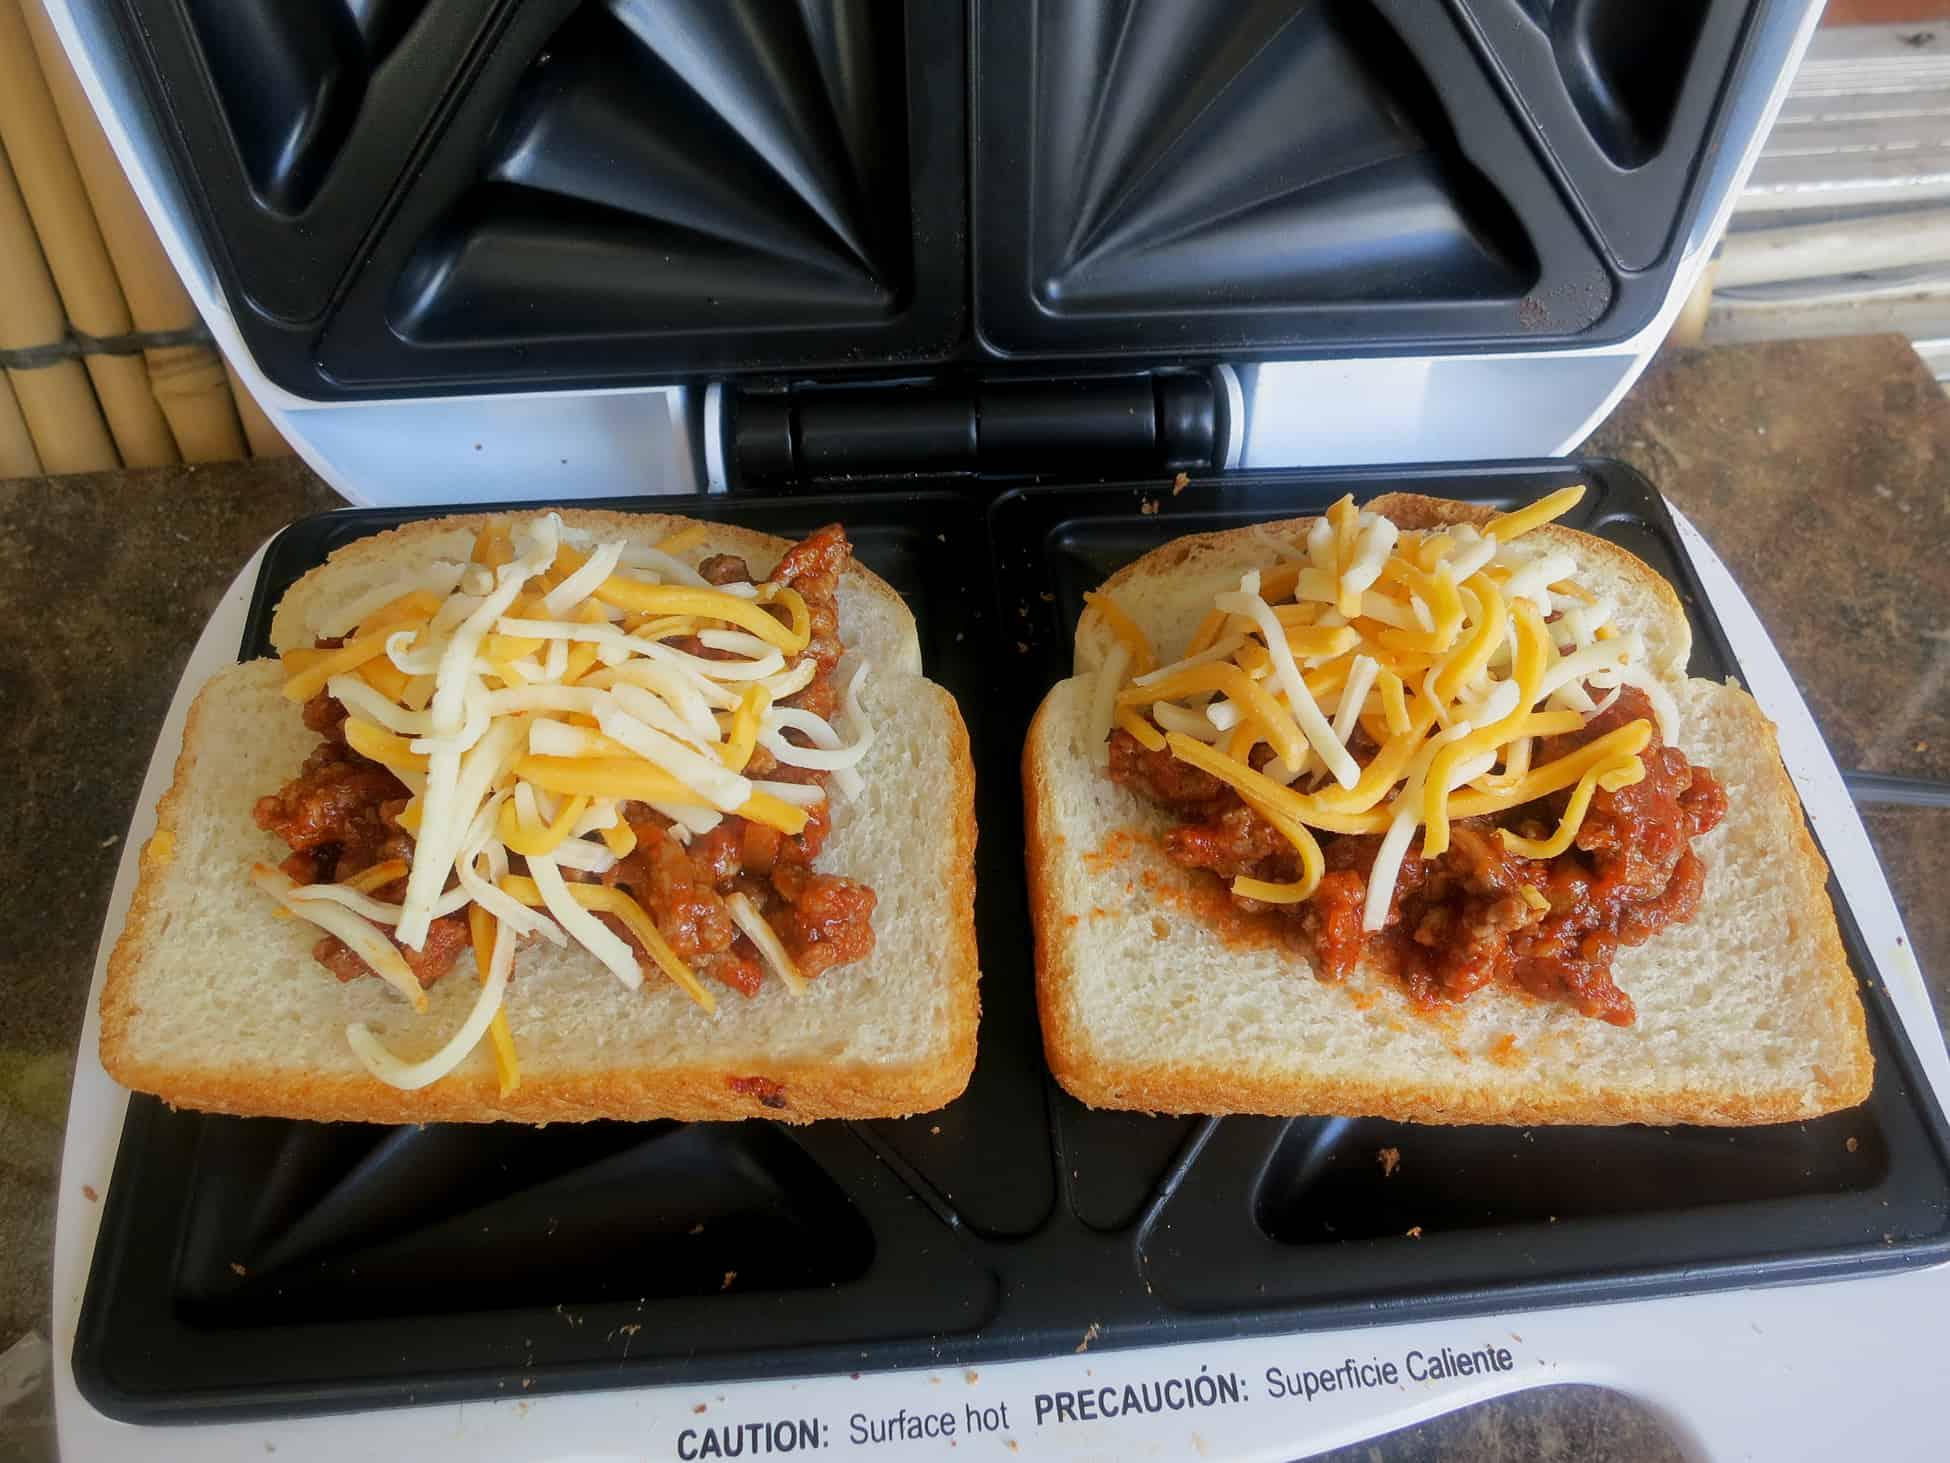 Ufo sandwiches